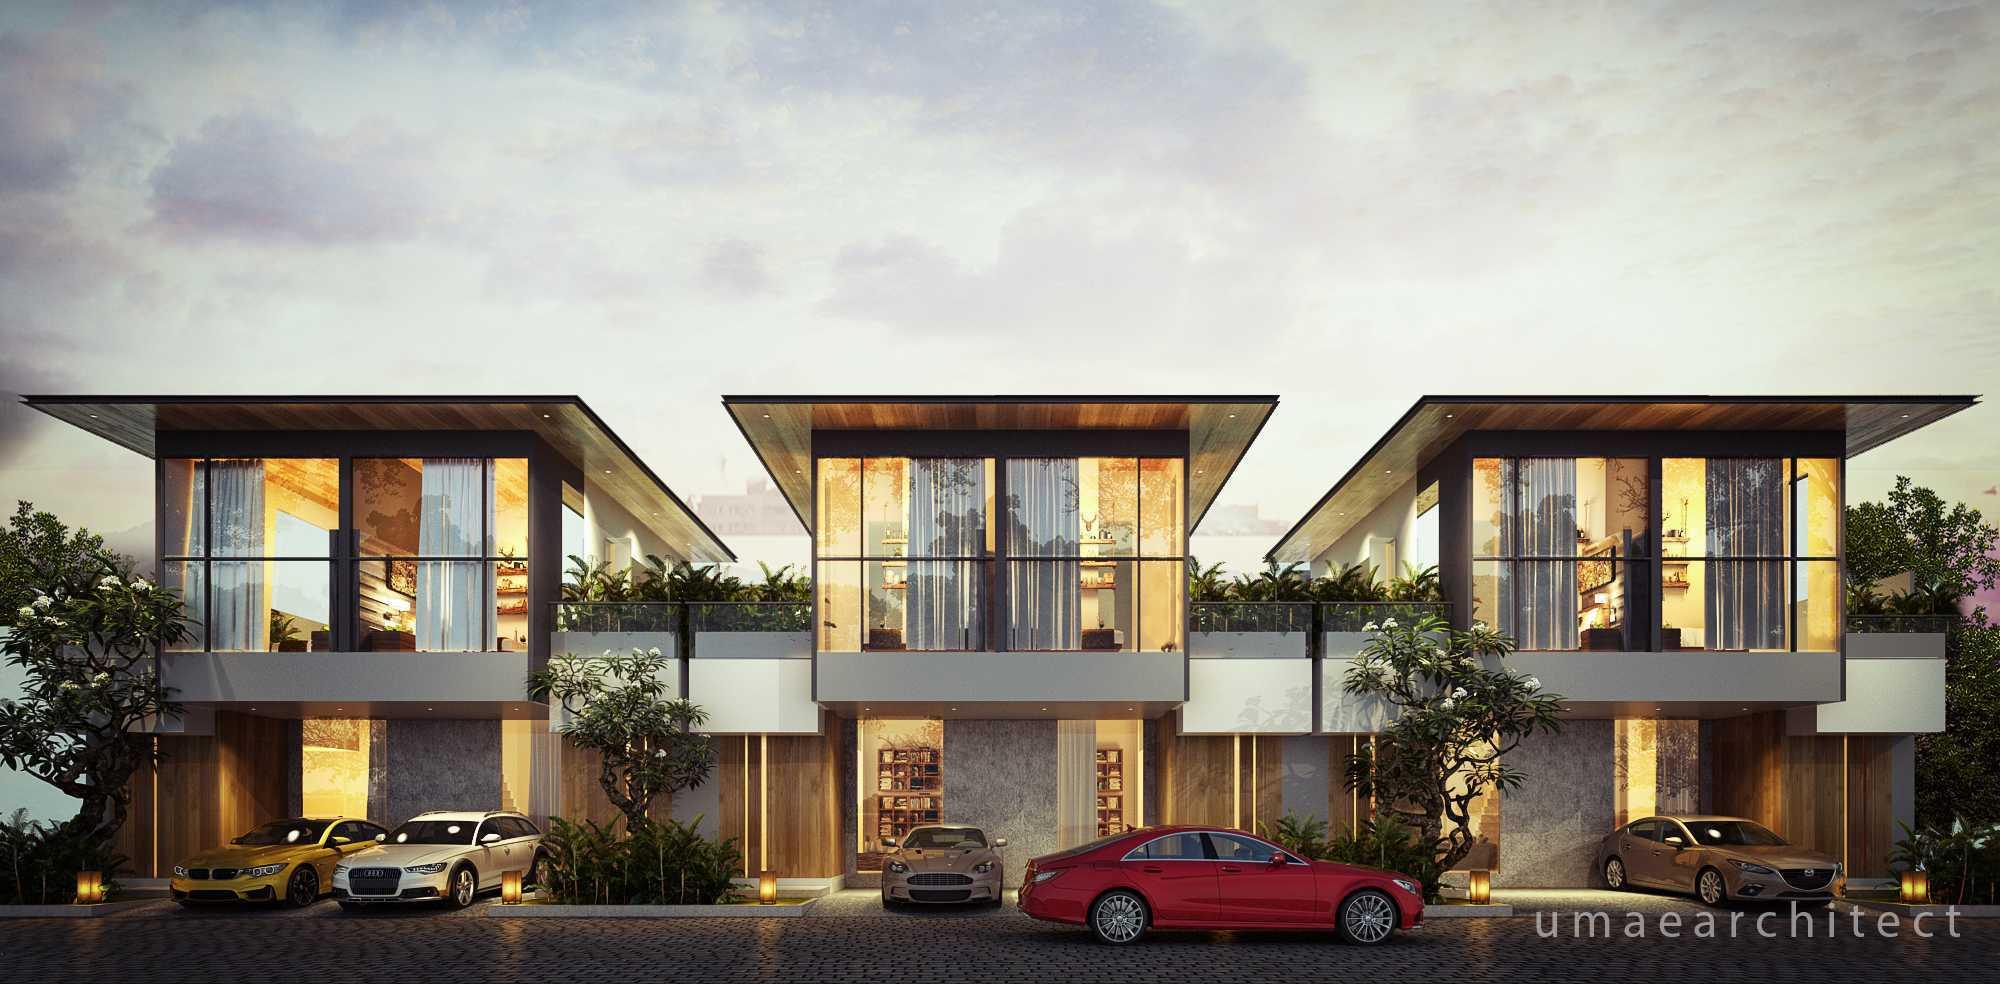 Prabu Hanggara Novena Villa Jl. Sunset Road, Kuta, Kabupaten Badung, Bali, Indonesia Jl. Sunset Road, Kuta, Kabupaten Badung, Bali, Indonesia Prabu-Hanggara-Novena-Villa   76526